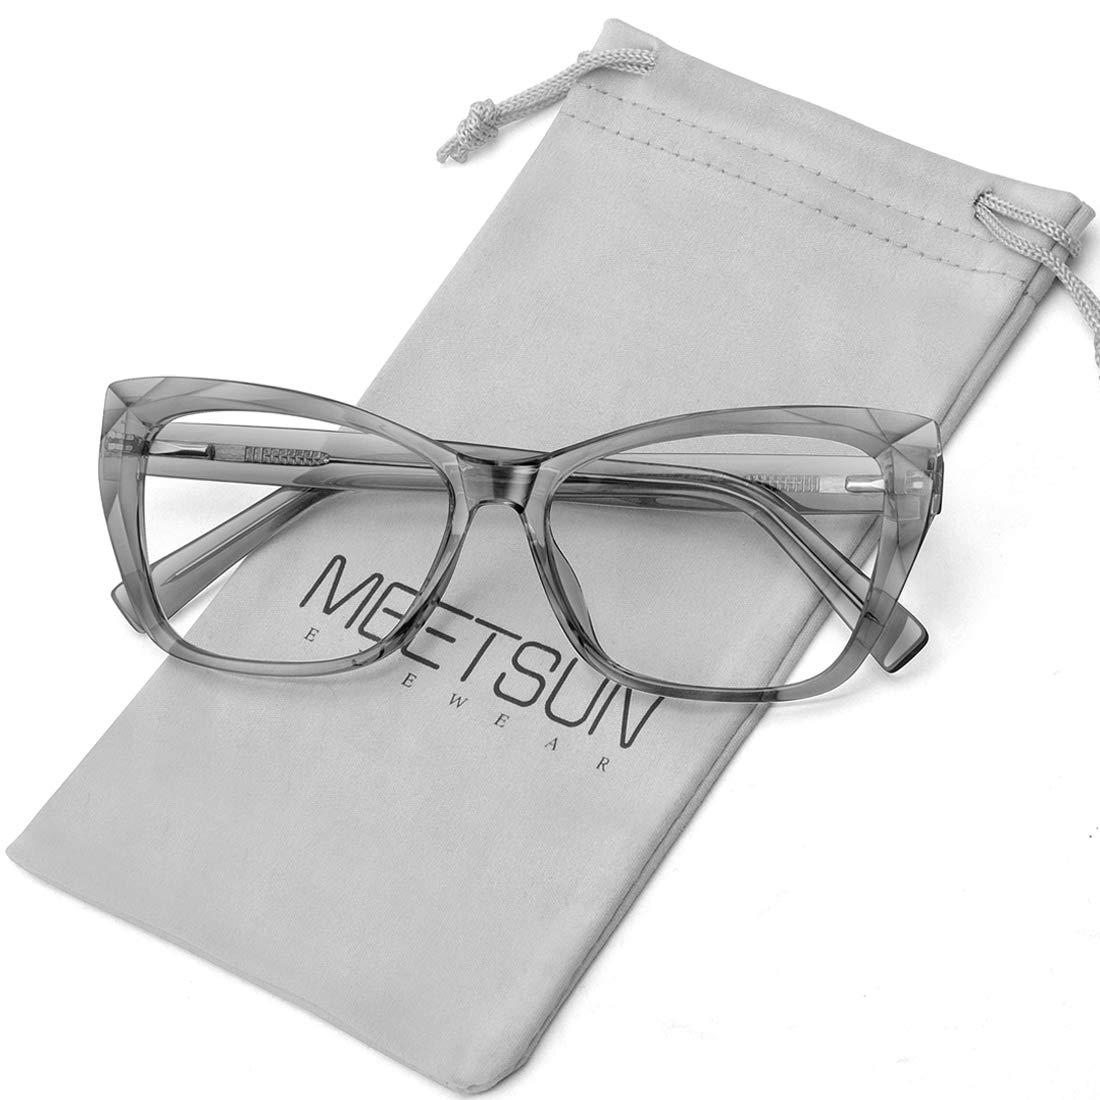 MEETSUN Blue Light Blocking Glasses Women Computer Reading/Gaming/TV/Phones Glasses,Anti Eyestrain